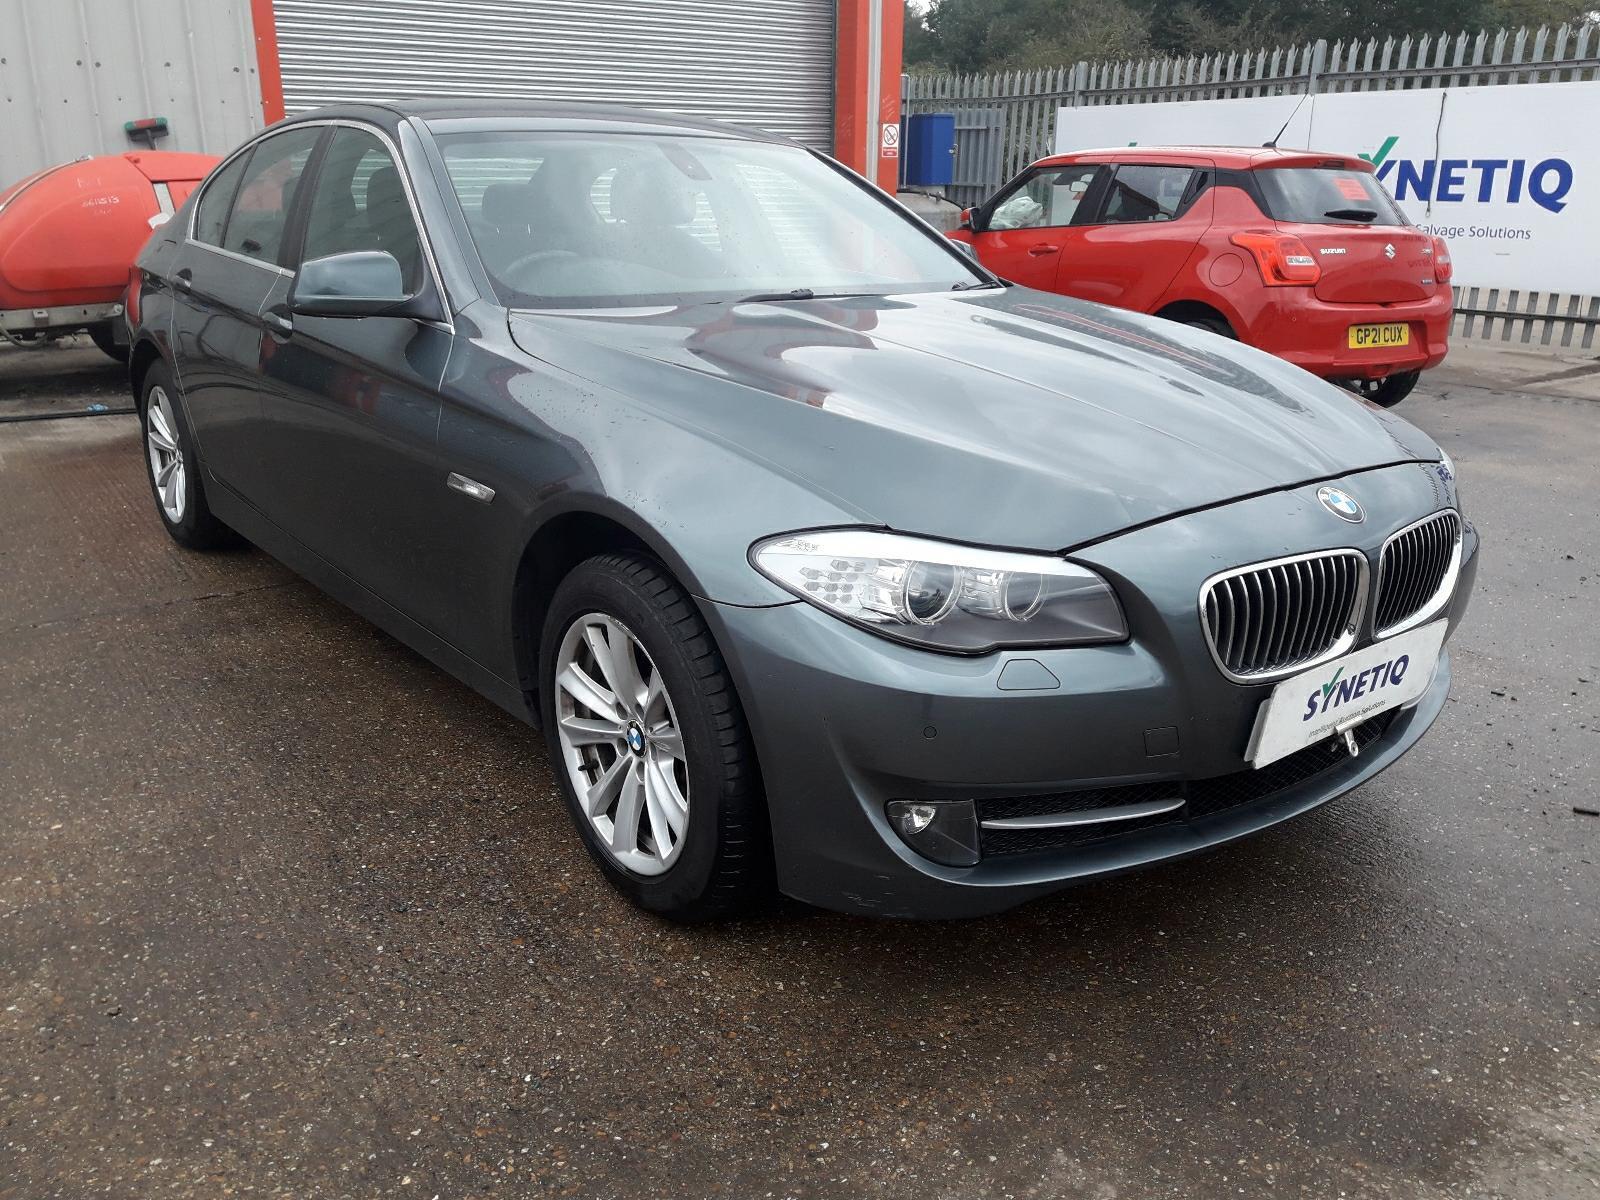 2011 BMW 5 SERIES 525D AC 2993cc TURBO DIESEL AUTOMATIC 8 Speed 4 DOOR SALOON